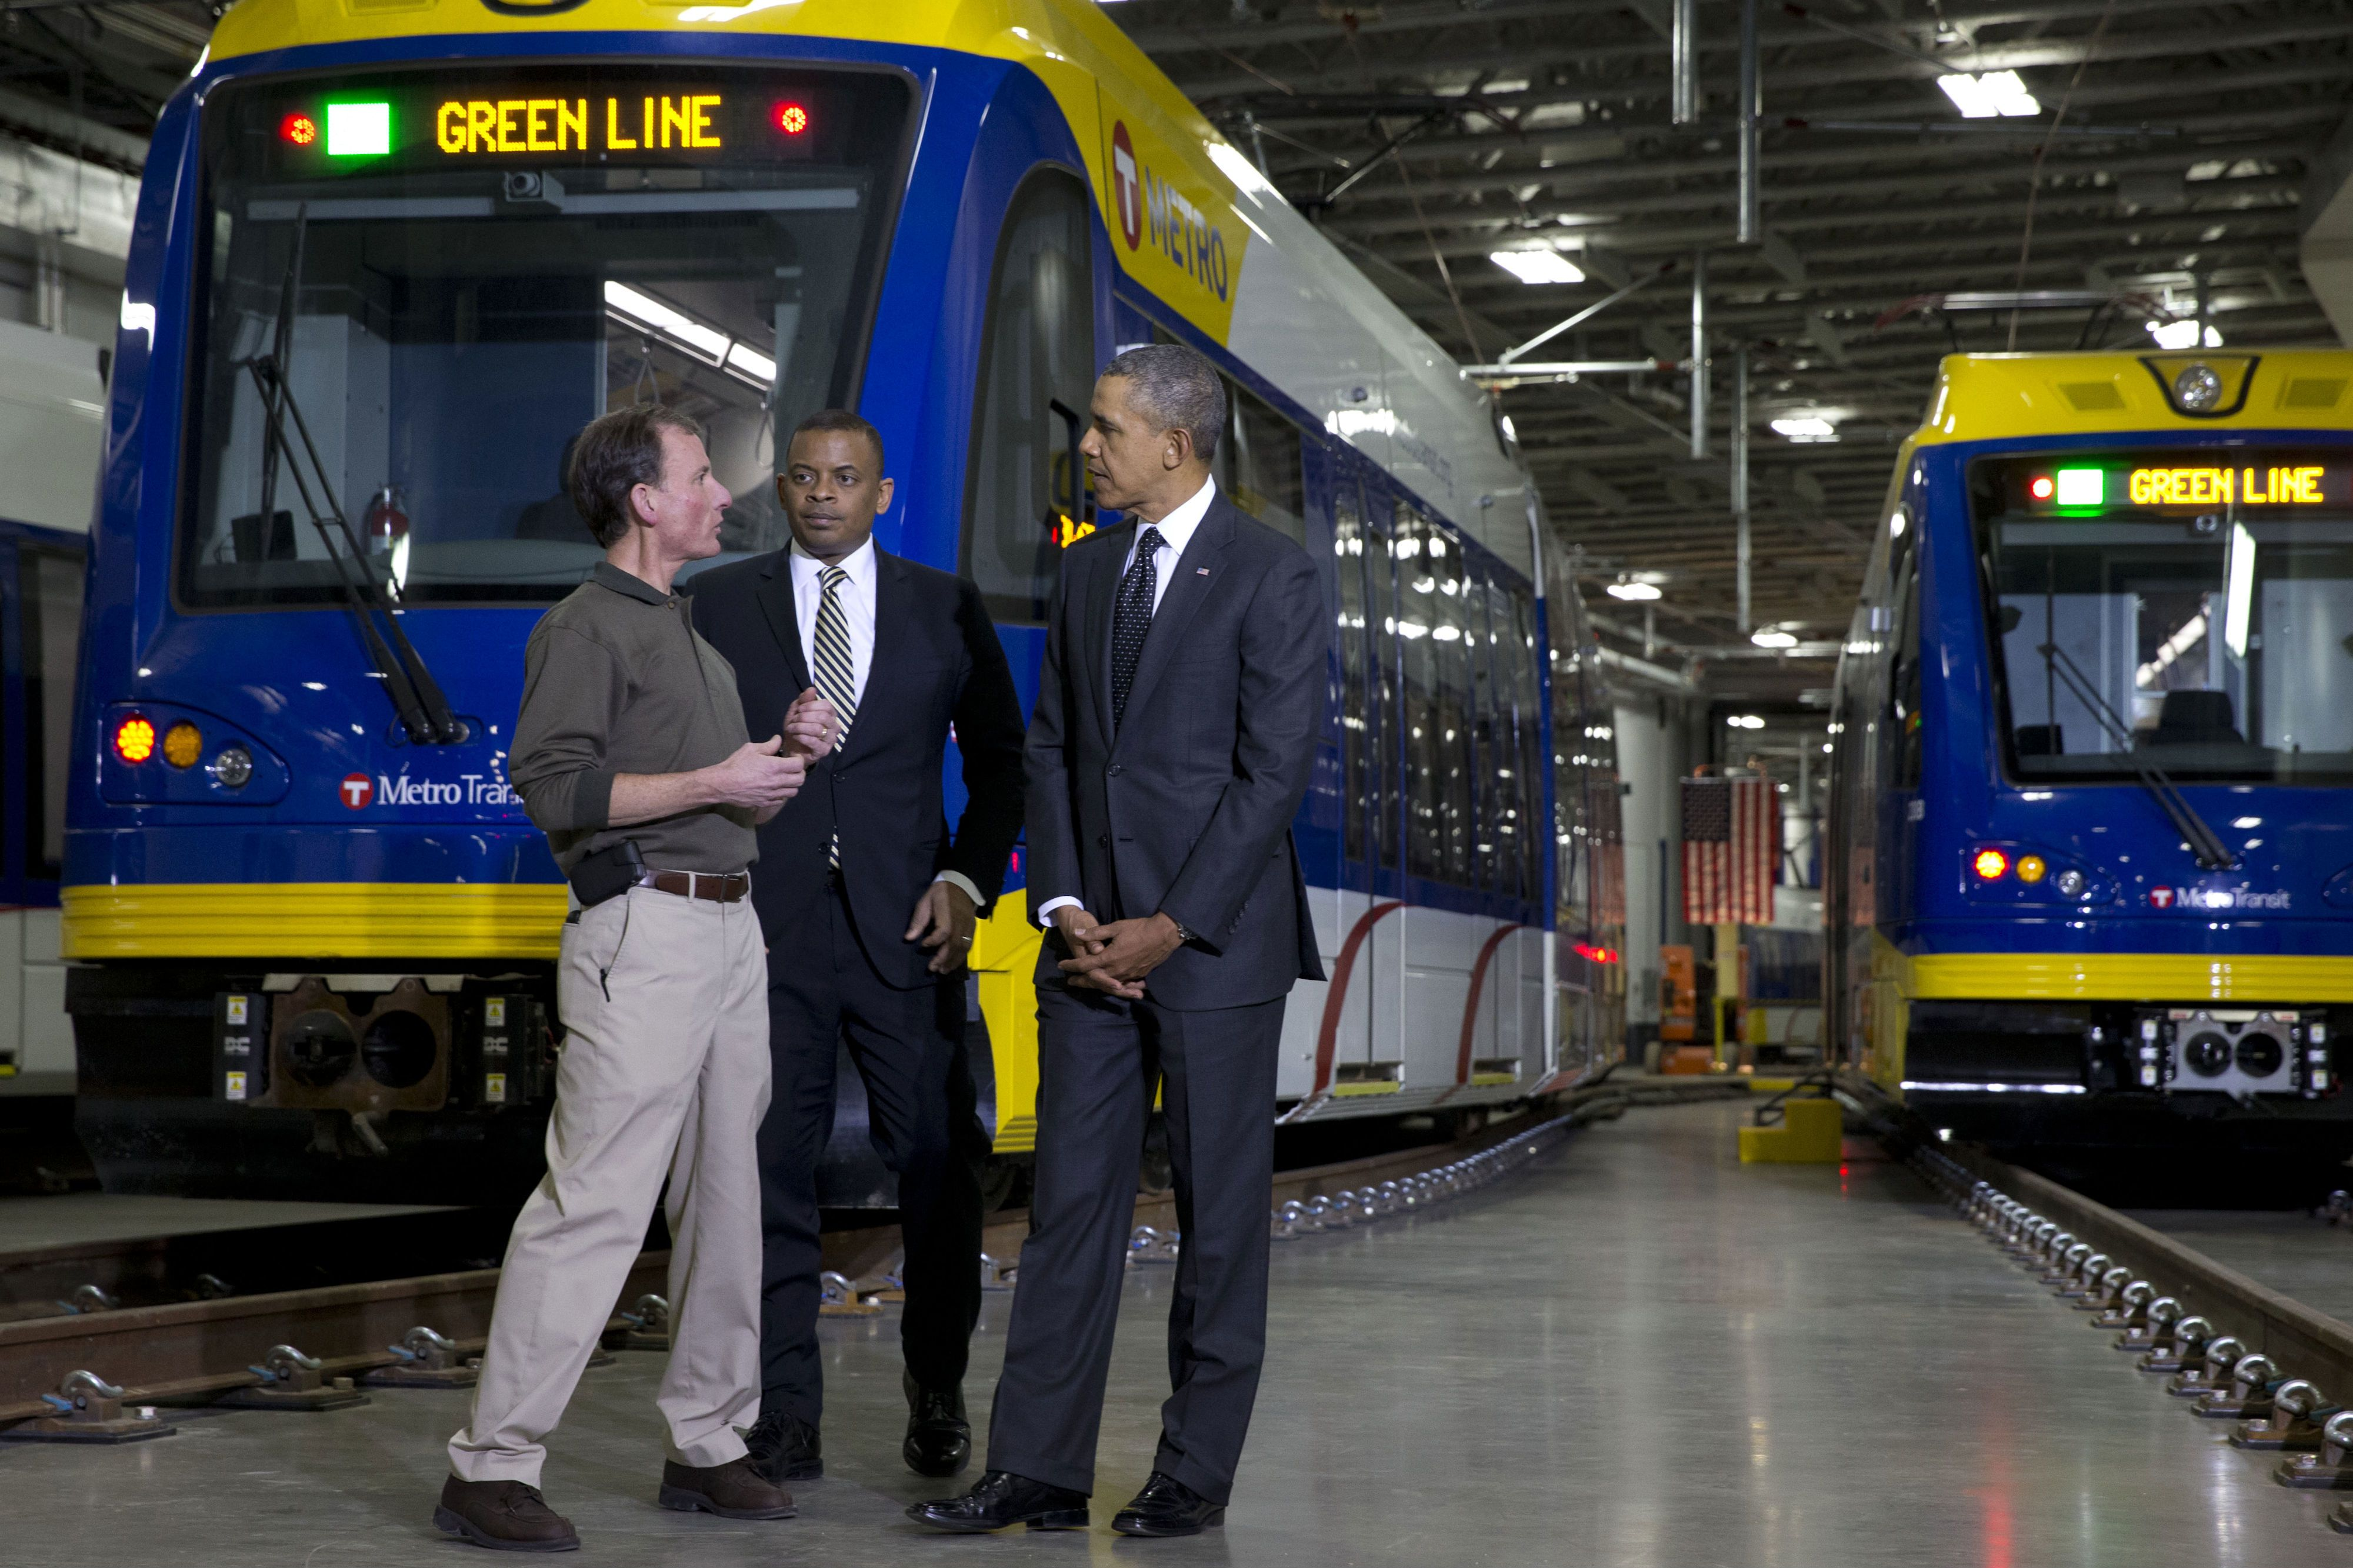 Pin on SoJustTransport Transportation and Social Justice